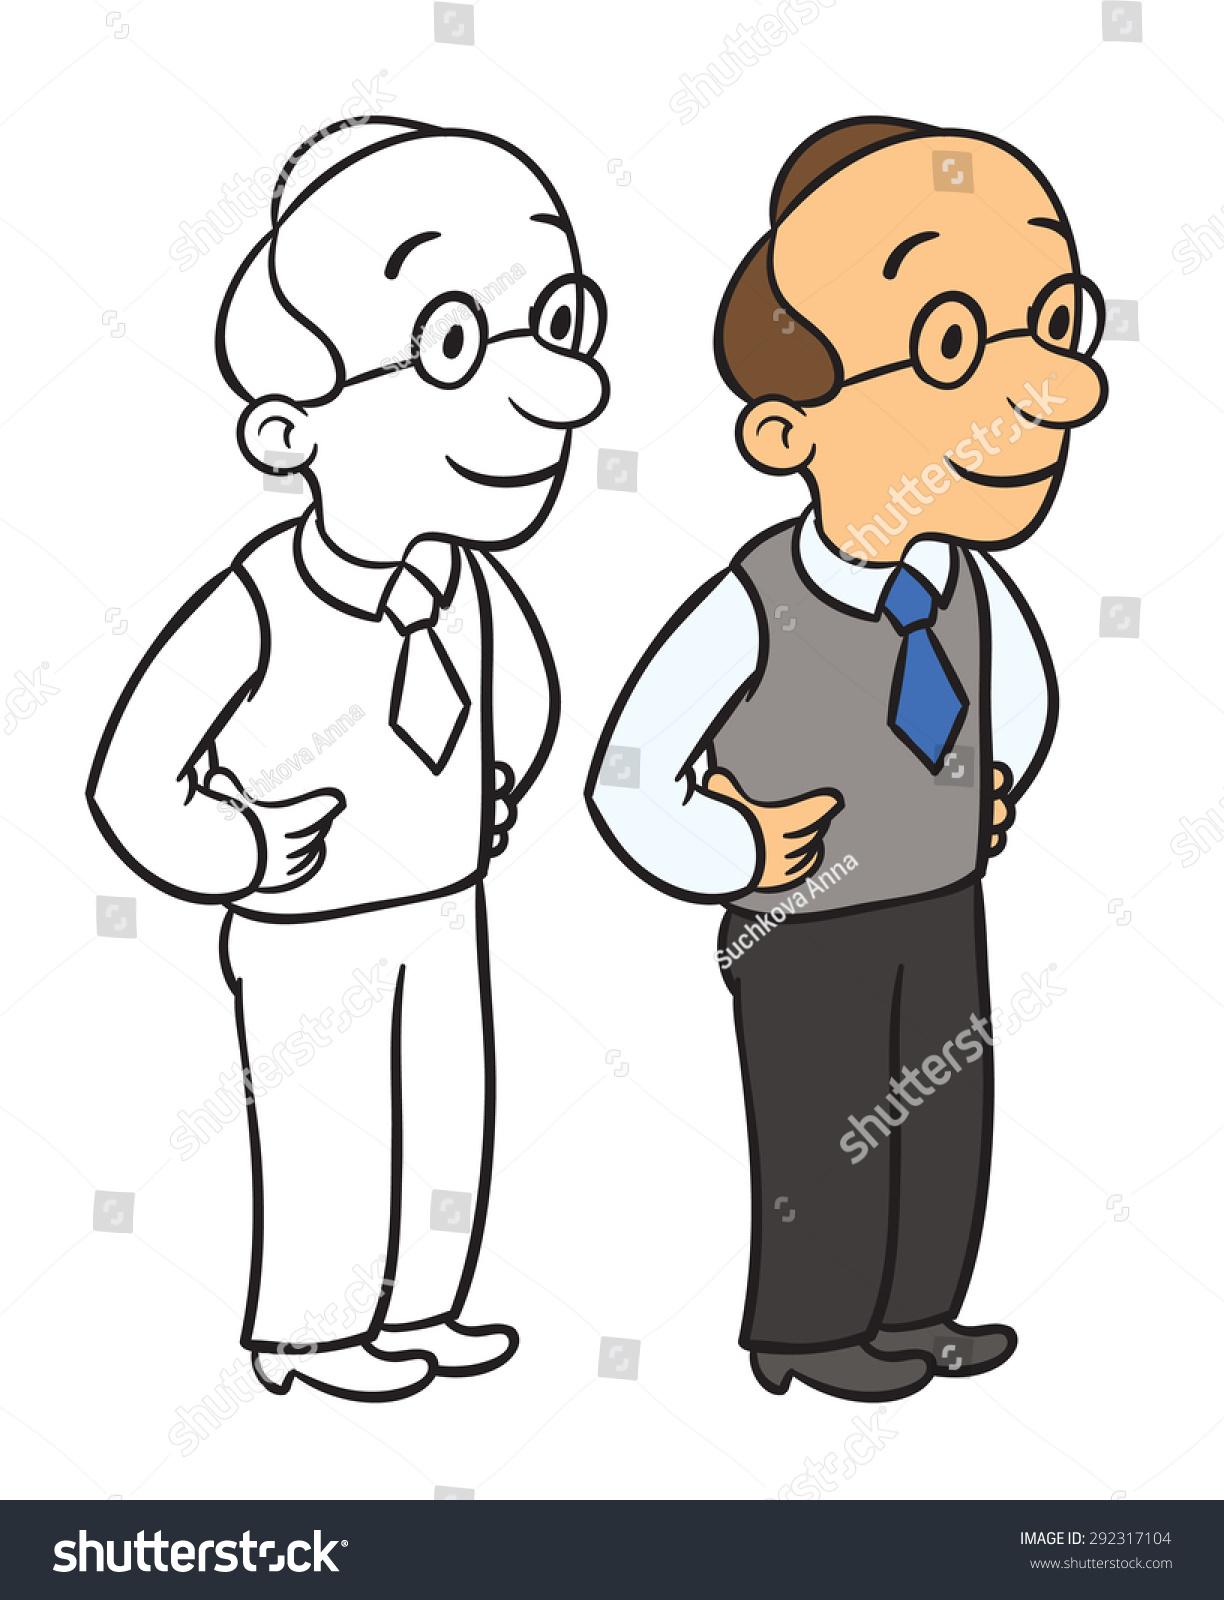 male office clerk cartoon comic office stock vector  male office clerk cartoon comic office worker vector illustration